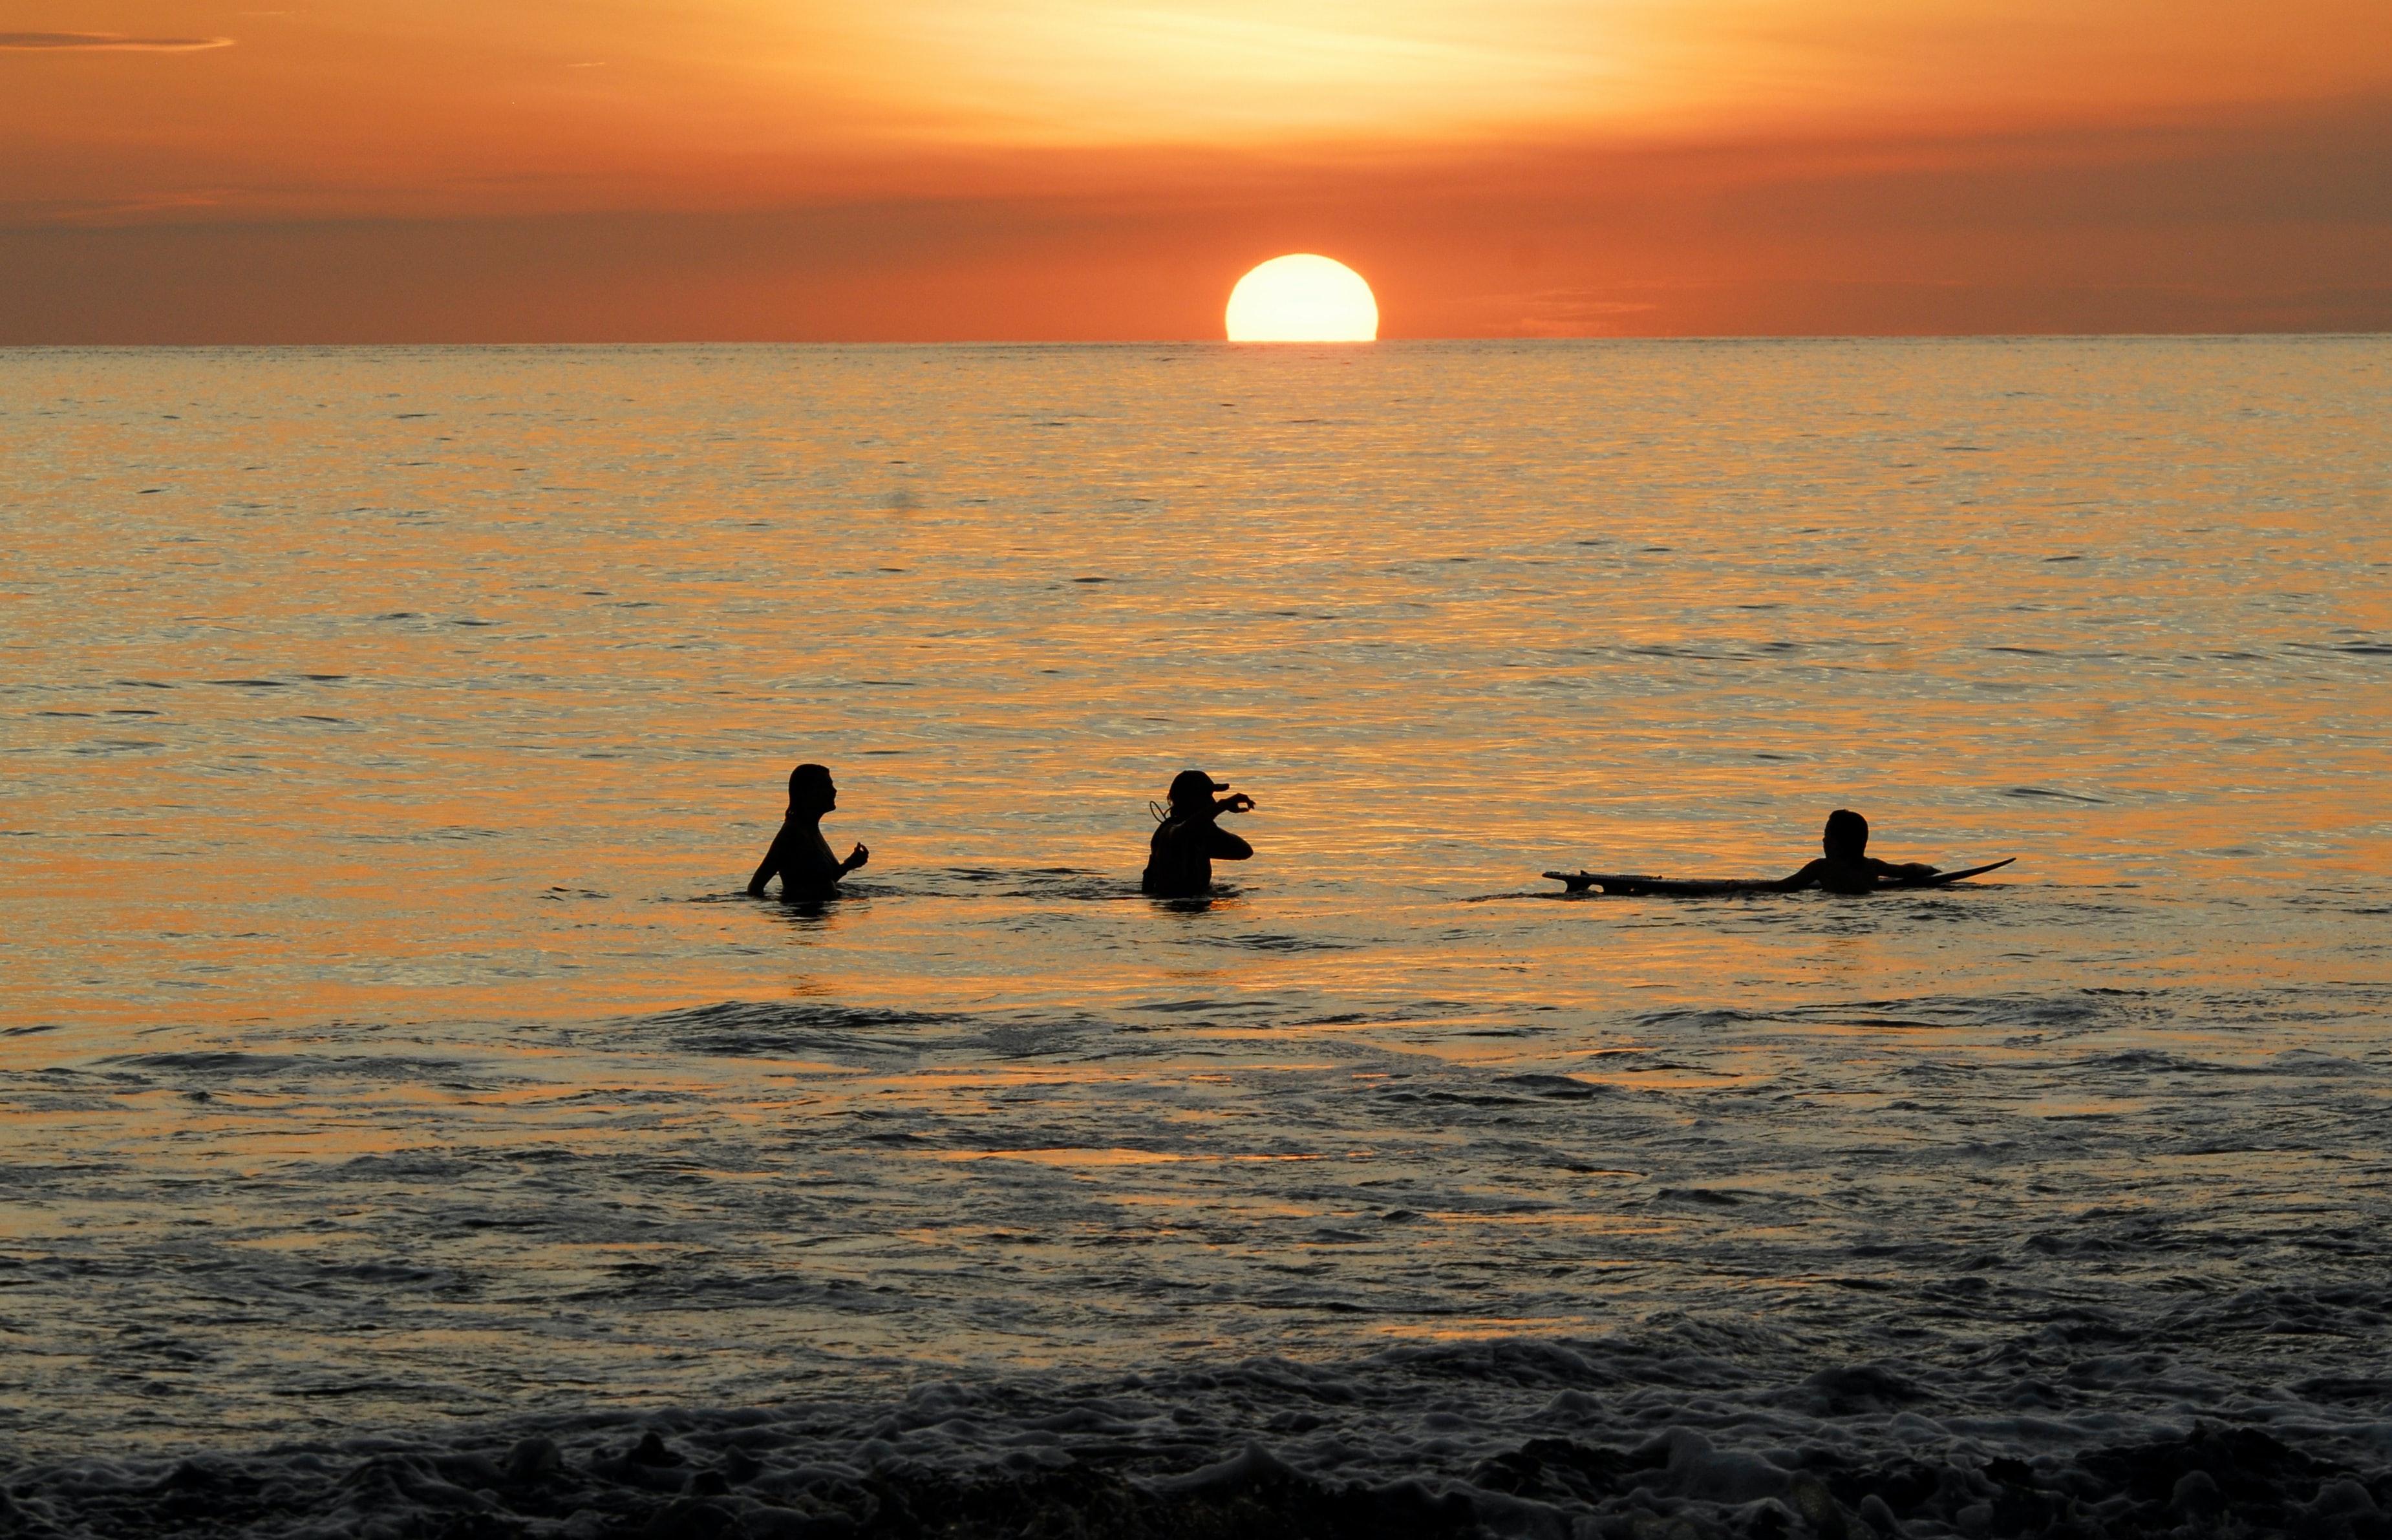 Sunset Surf on Costa Rica's Pacific Coast